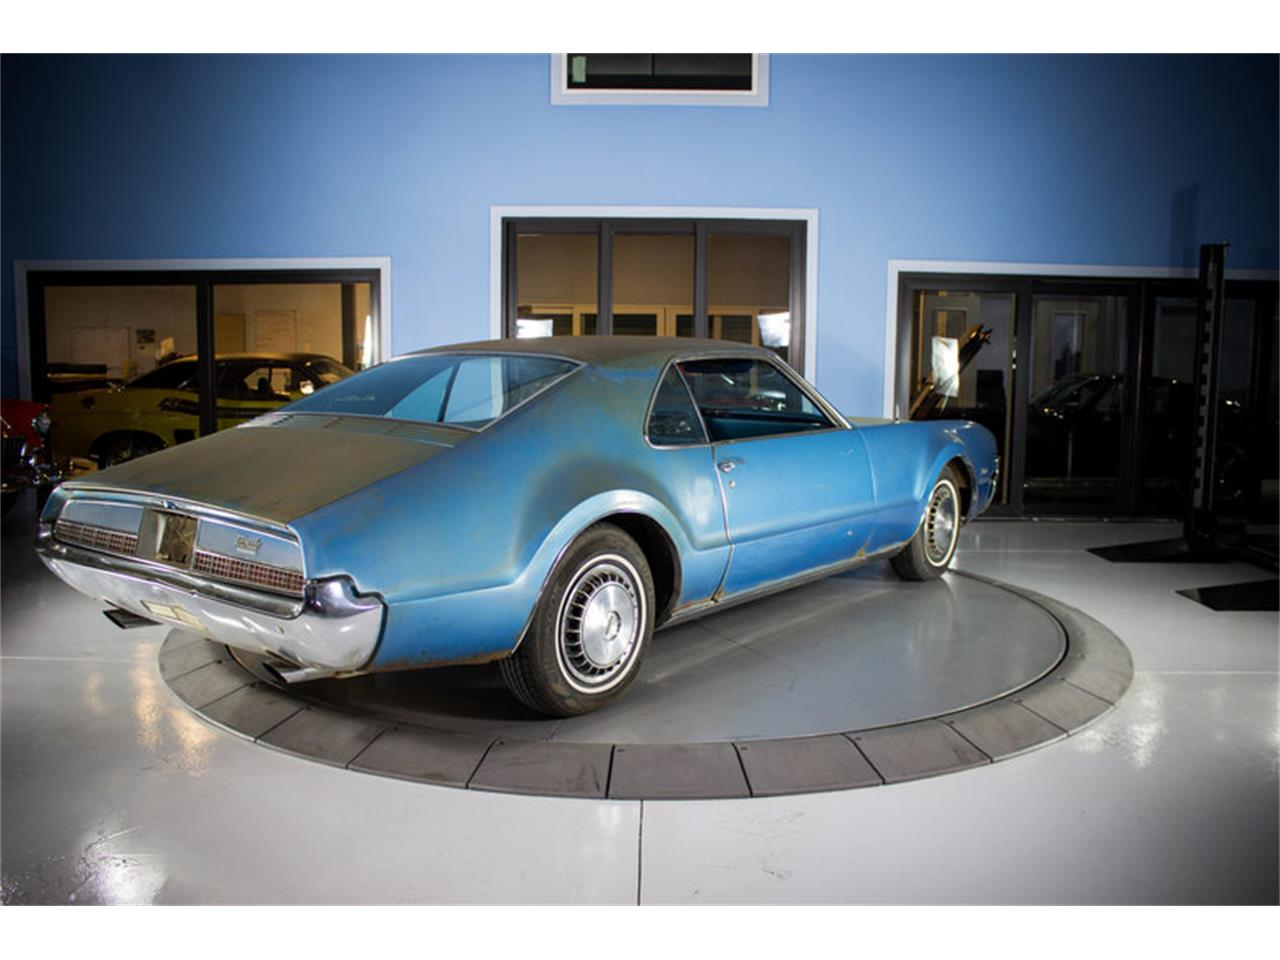 Large Picture of Classic 1967 Toronado located in Florida - $6,997.00 - MZFB